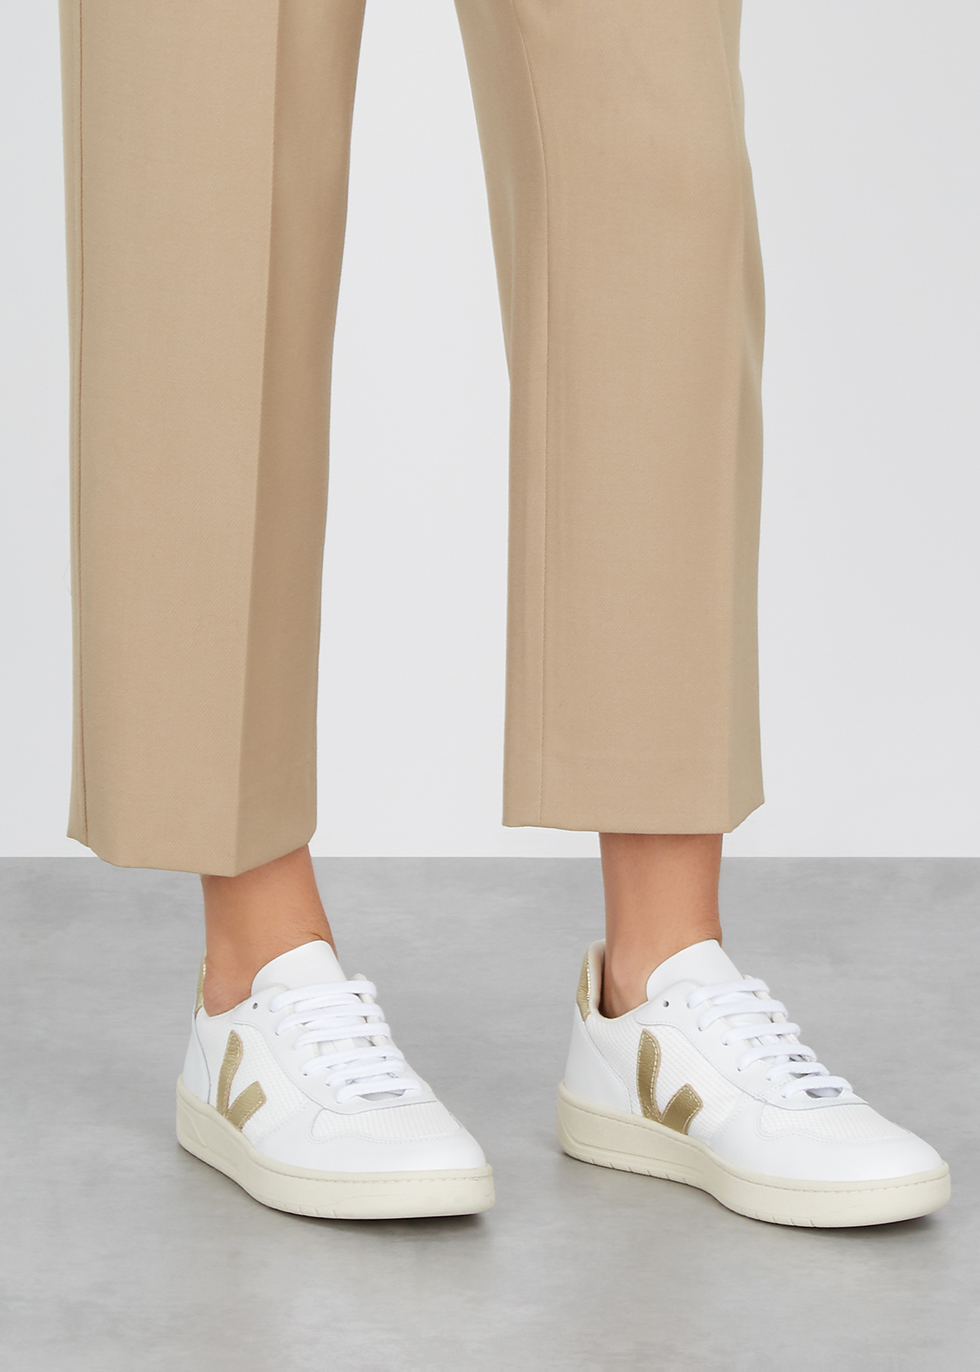 white mesh sneakers - Harvey Nichols